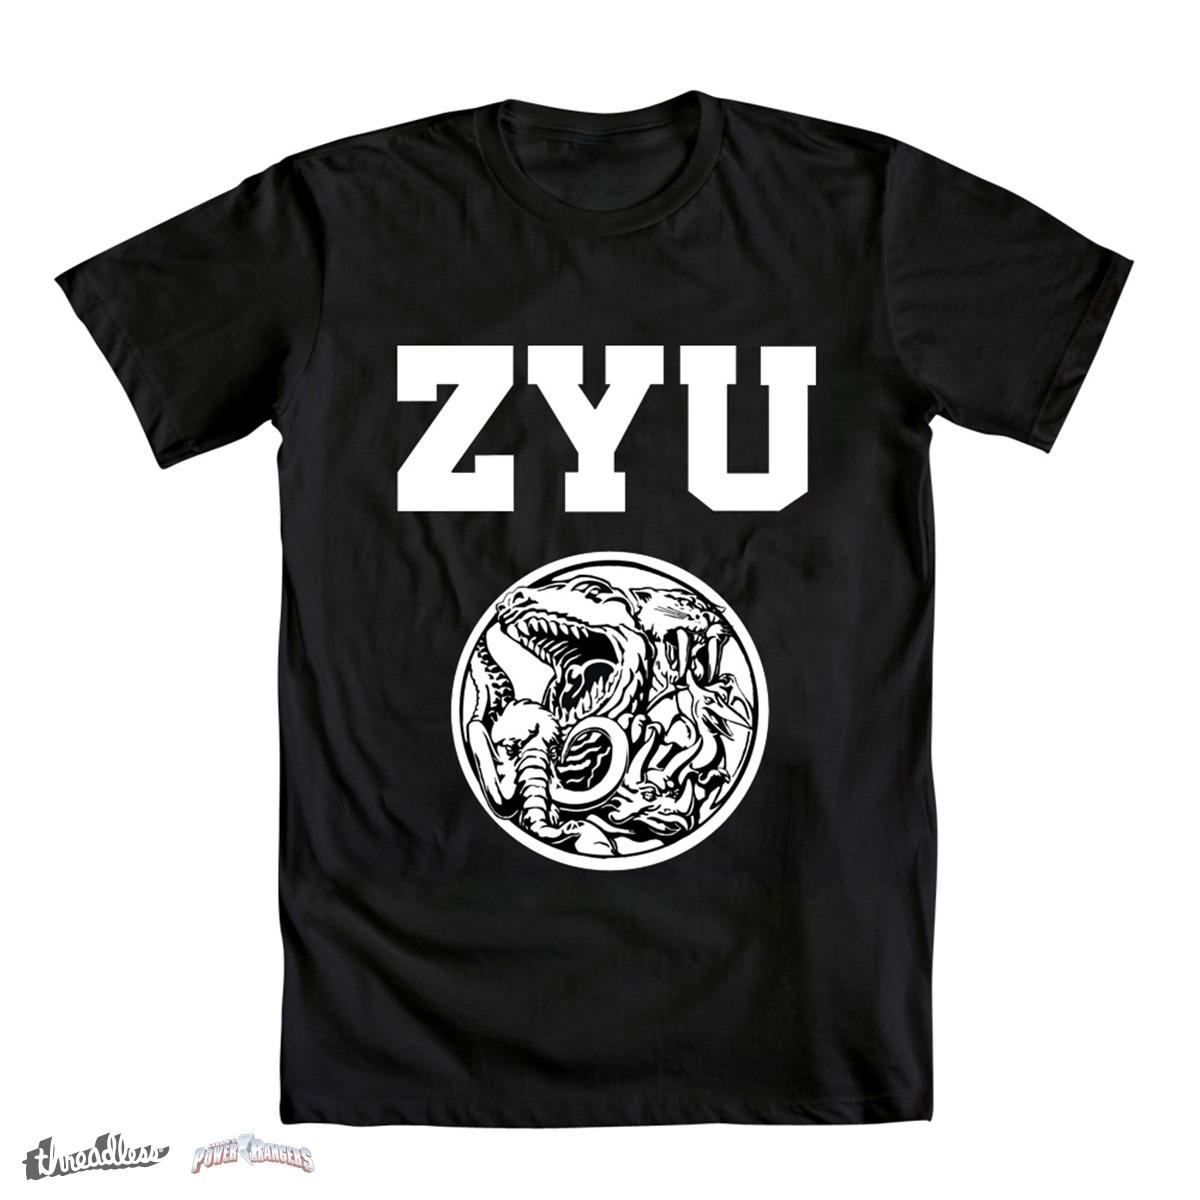 ZYUniversity by IllustratorErik on Threadless